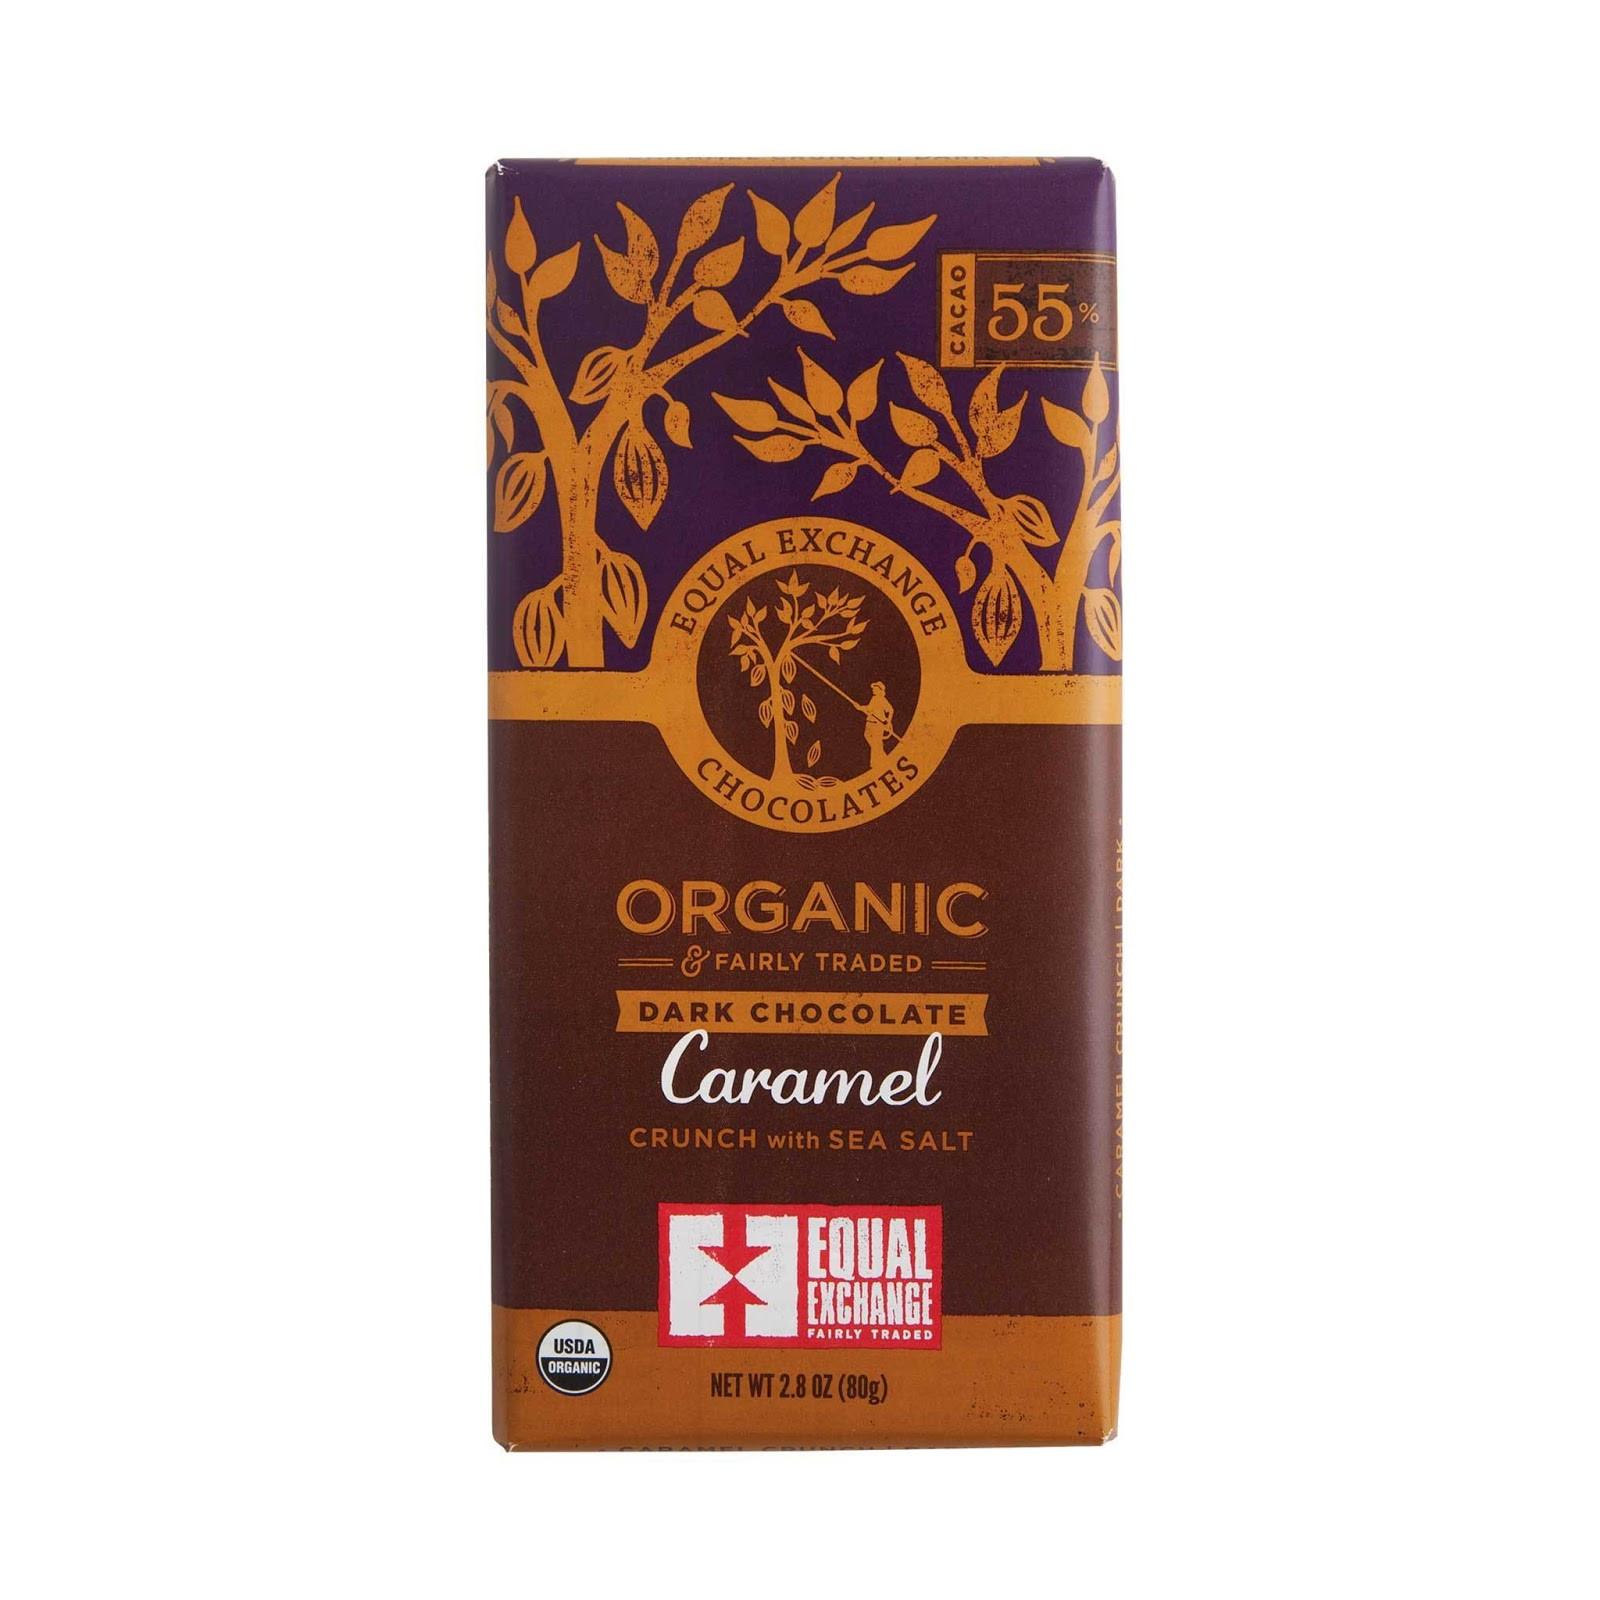 Organic Dark Chocolate Caramel Crunch {55% Cacao}